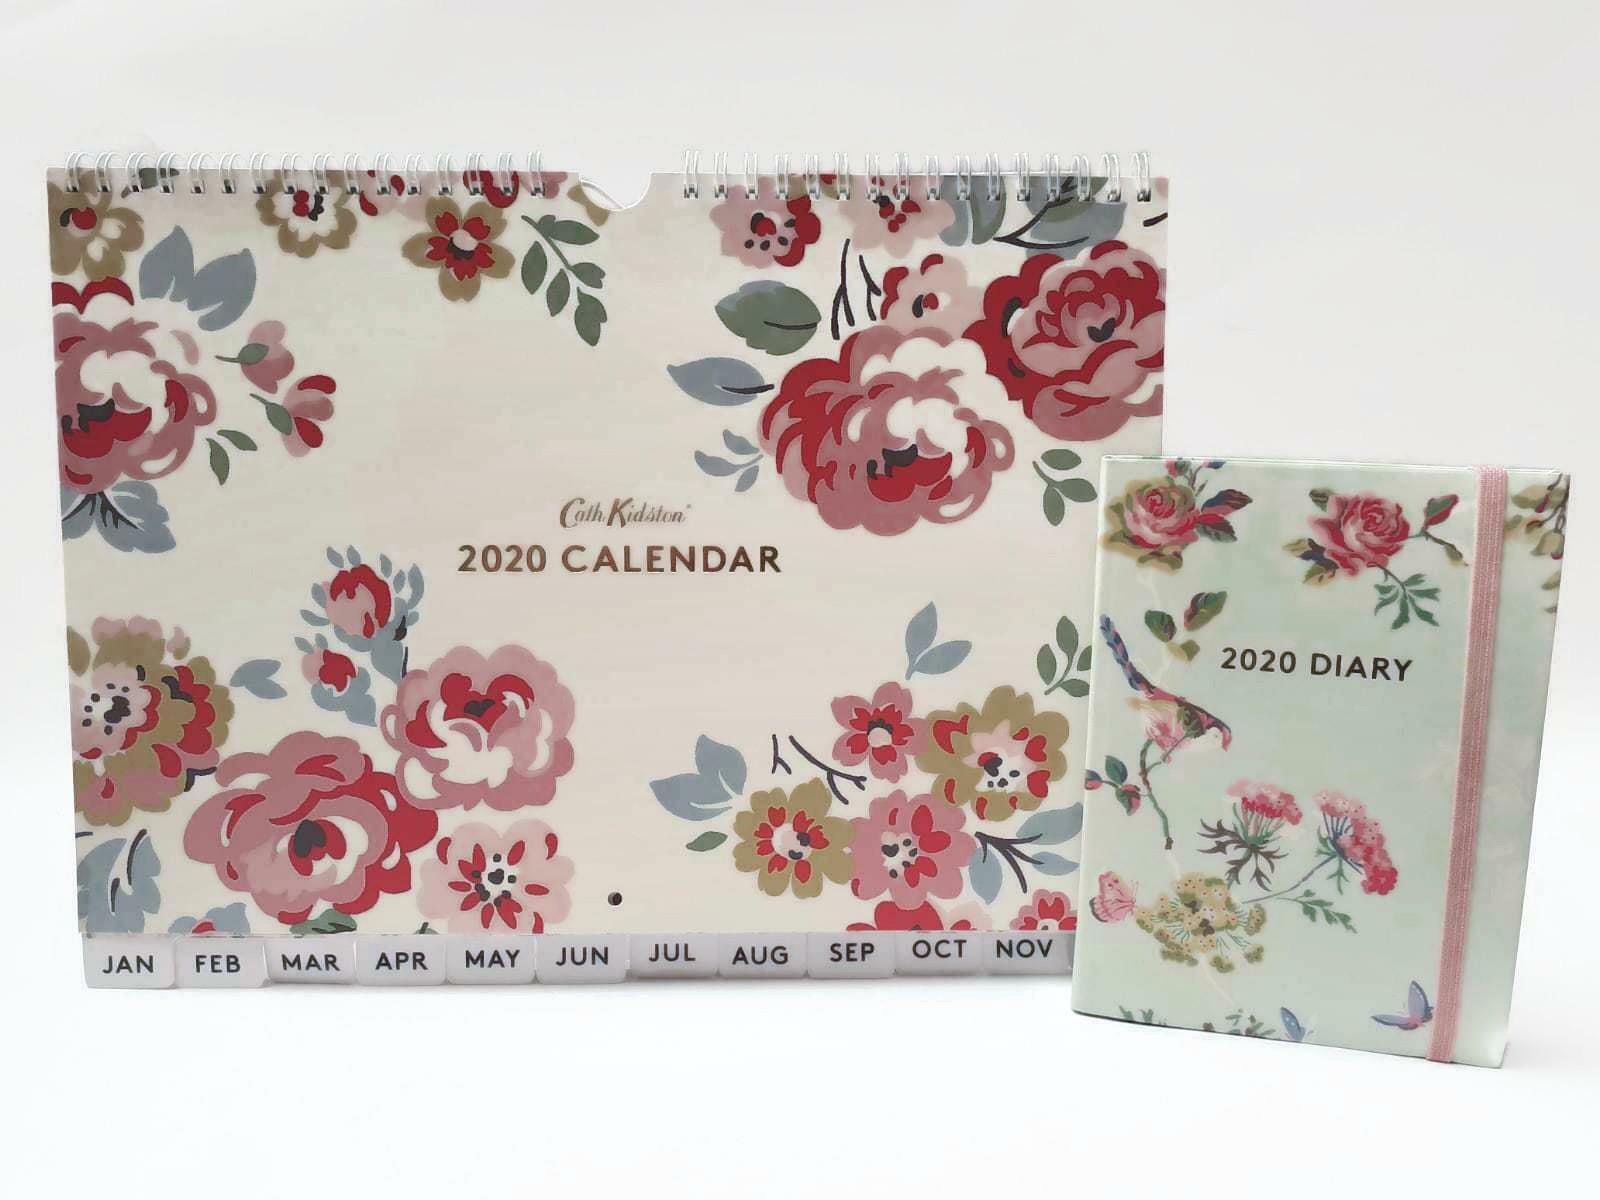 Calendario Rosa 2020.Cath Kidston Wells Rosa 2020 Calendario Da Parete Uccelli